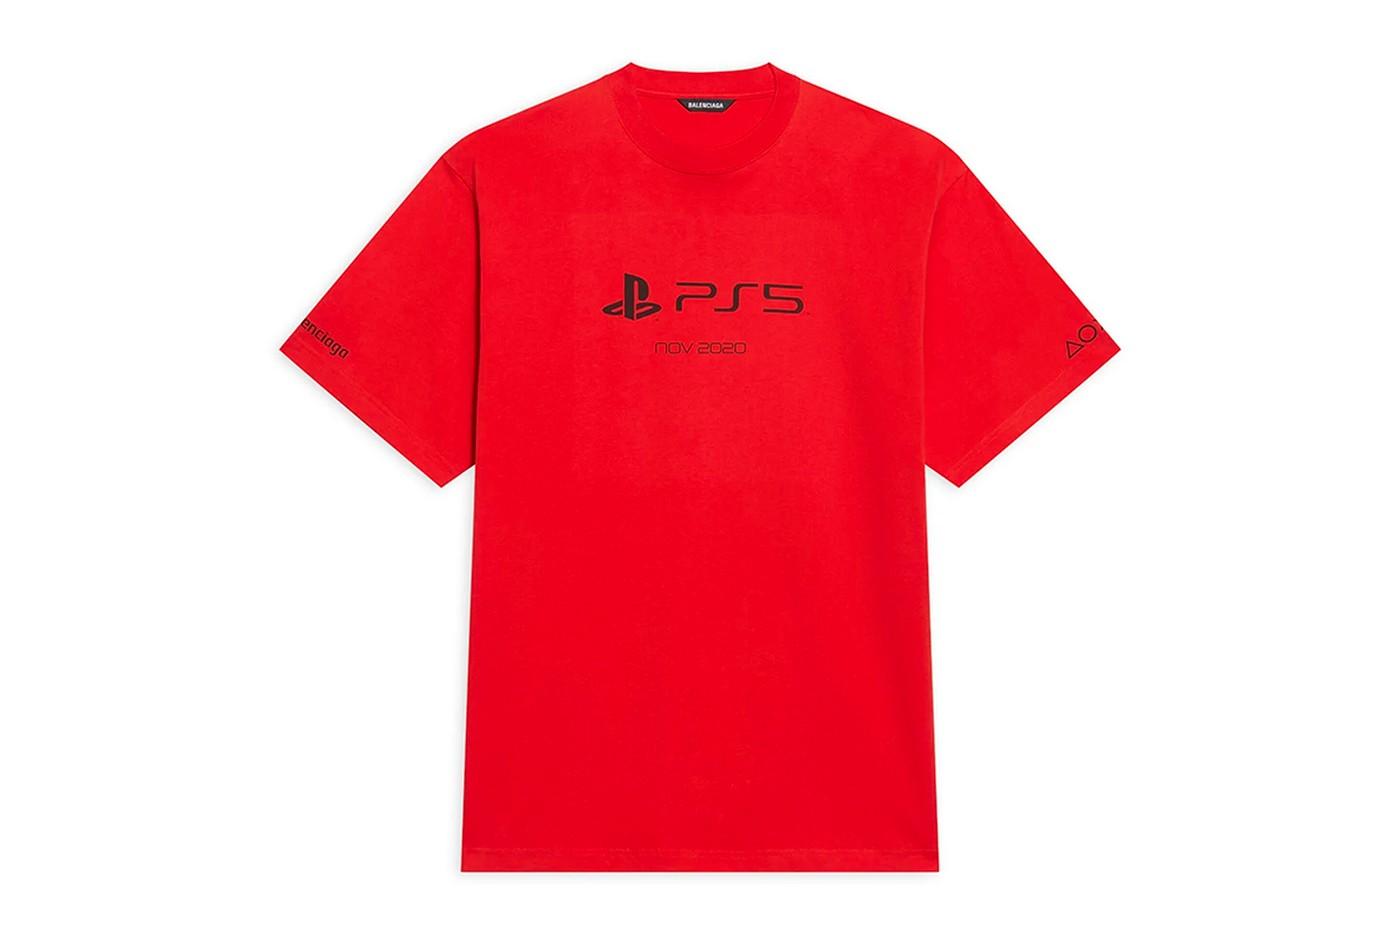 Balenciaga выпустил мерч для игровой консоли Sony PlayStation 5 (фото 3)